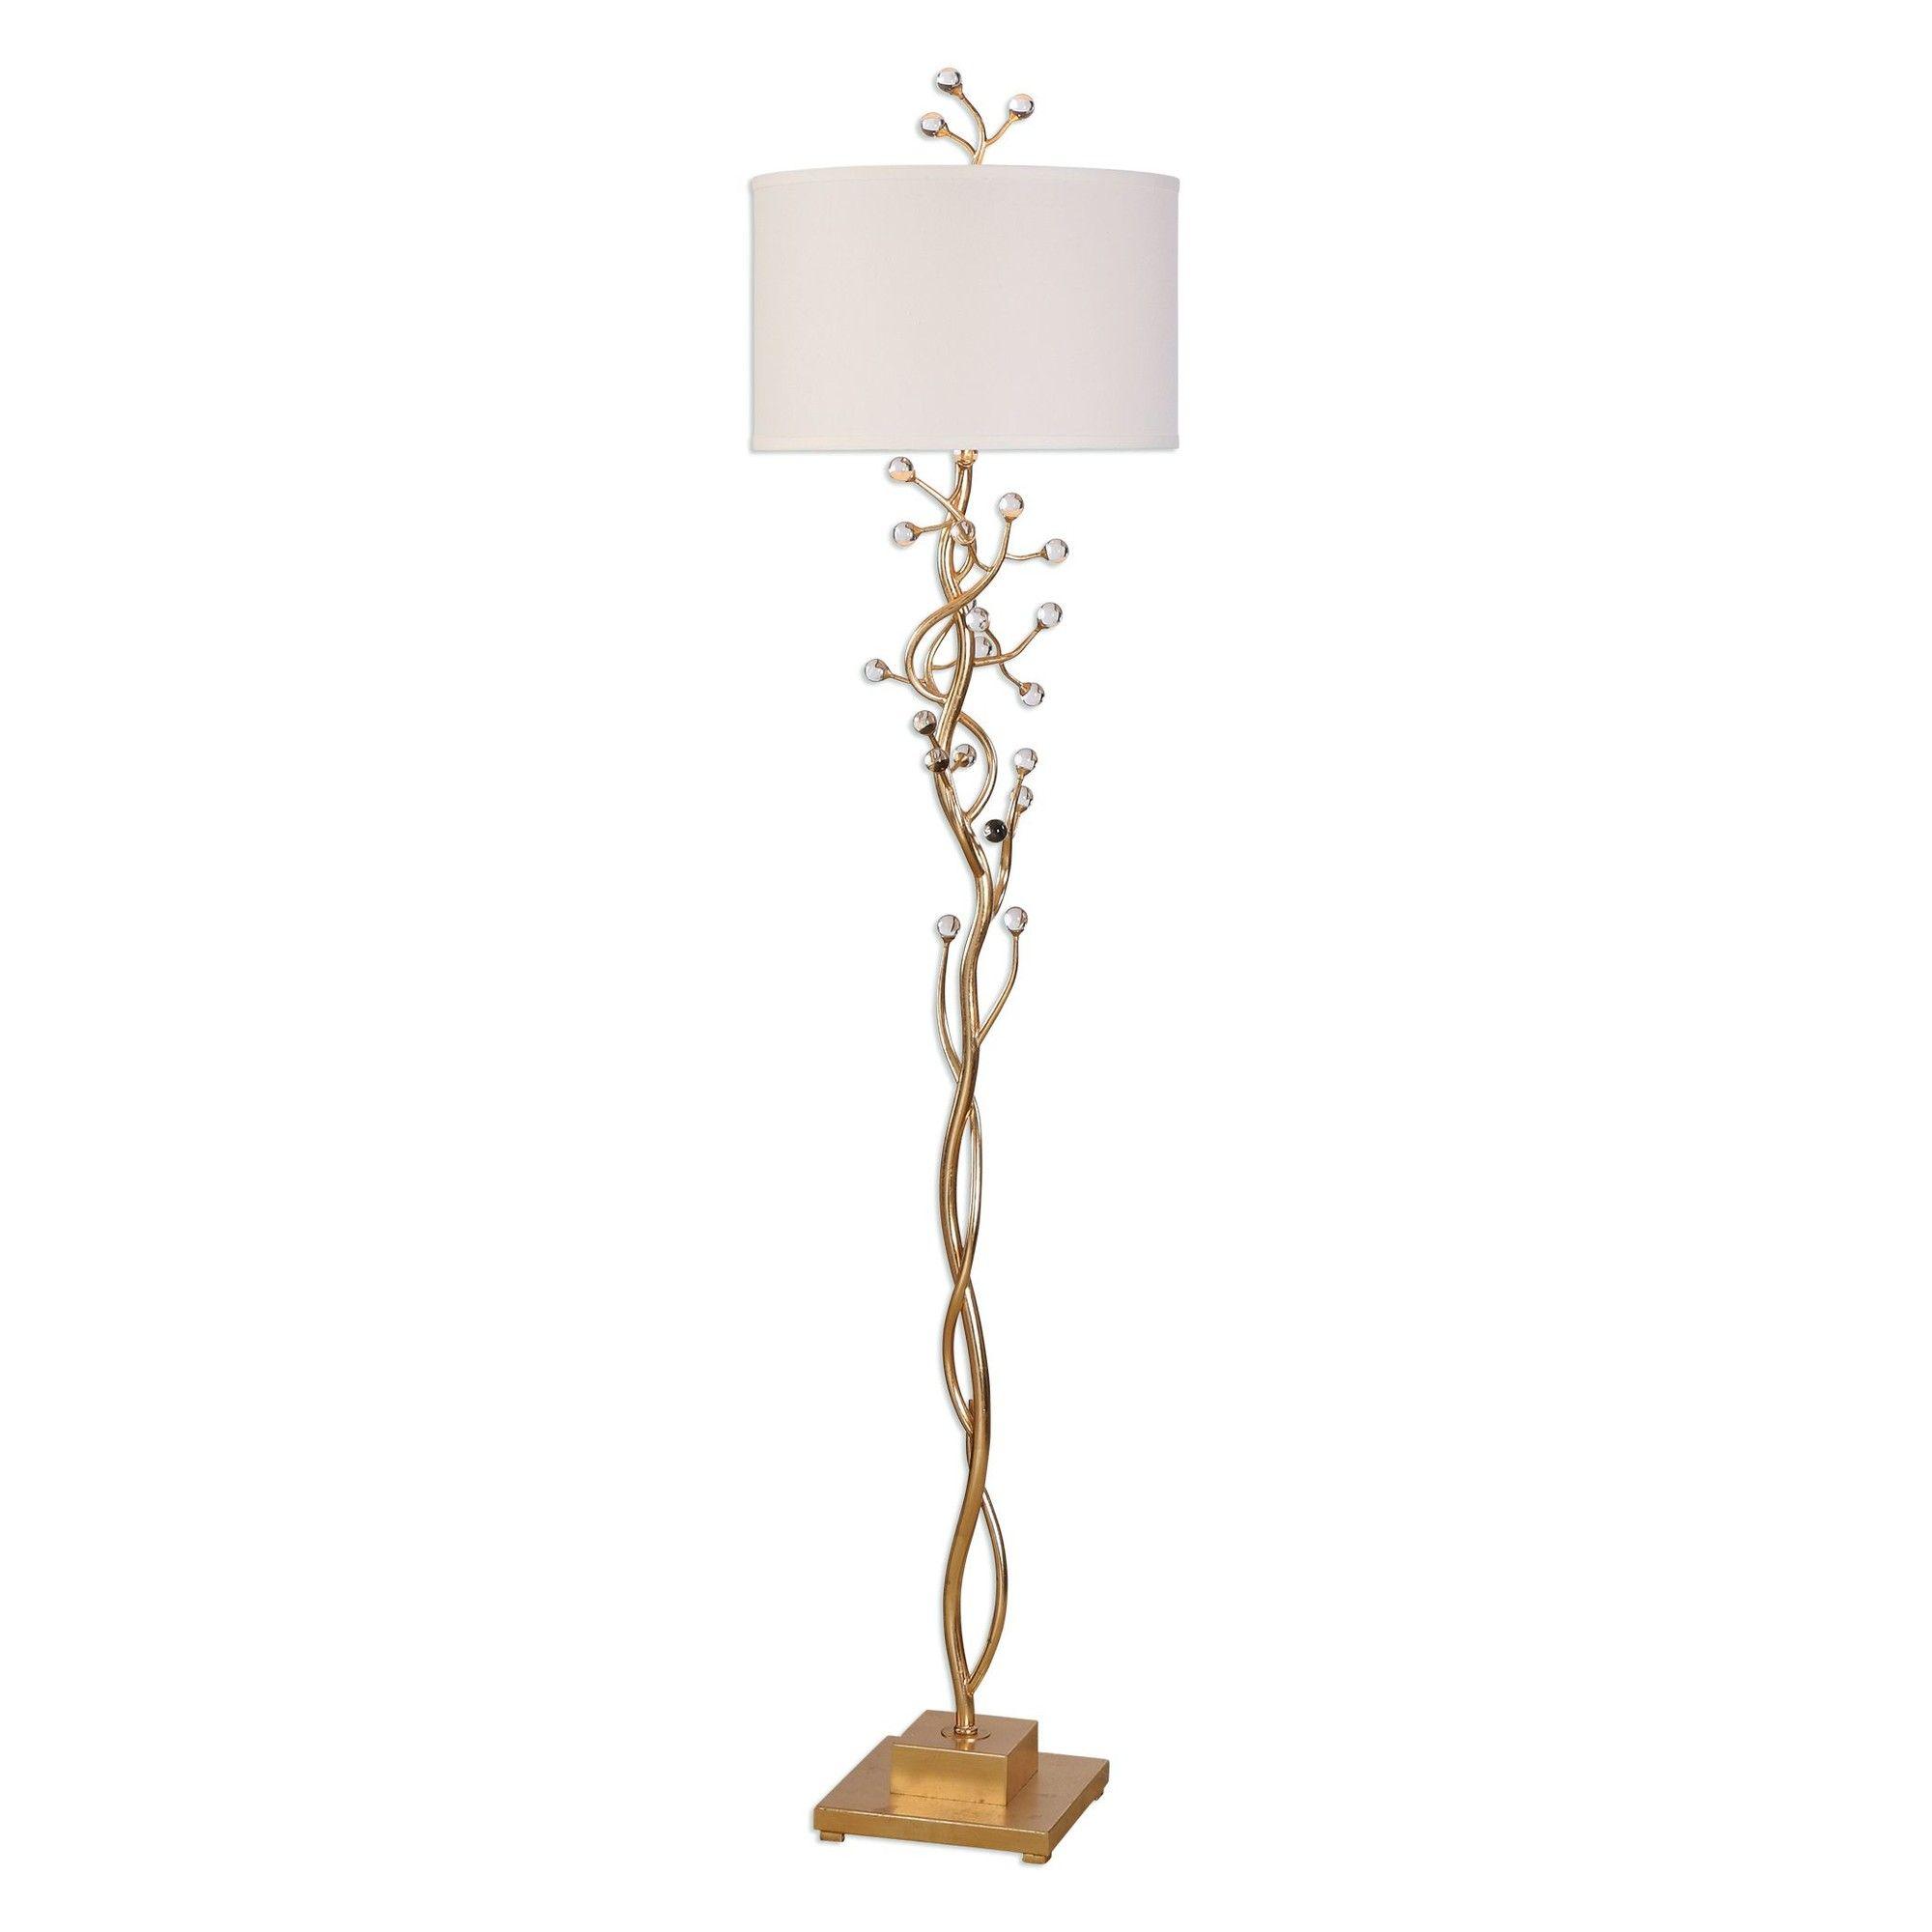 "Garson 68.25"" Torchiere Floor Lamp Gold floor lamp"